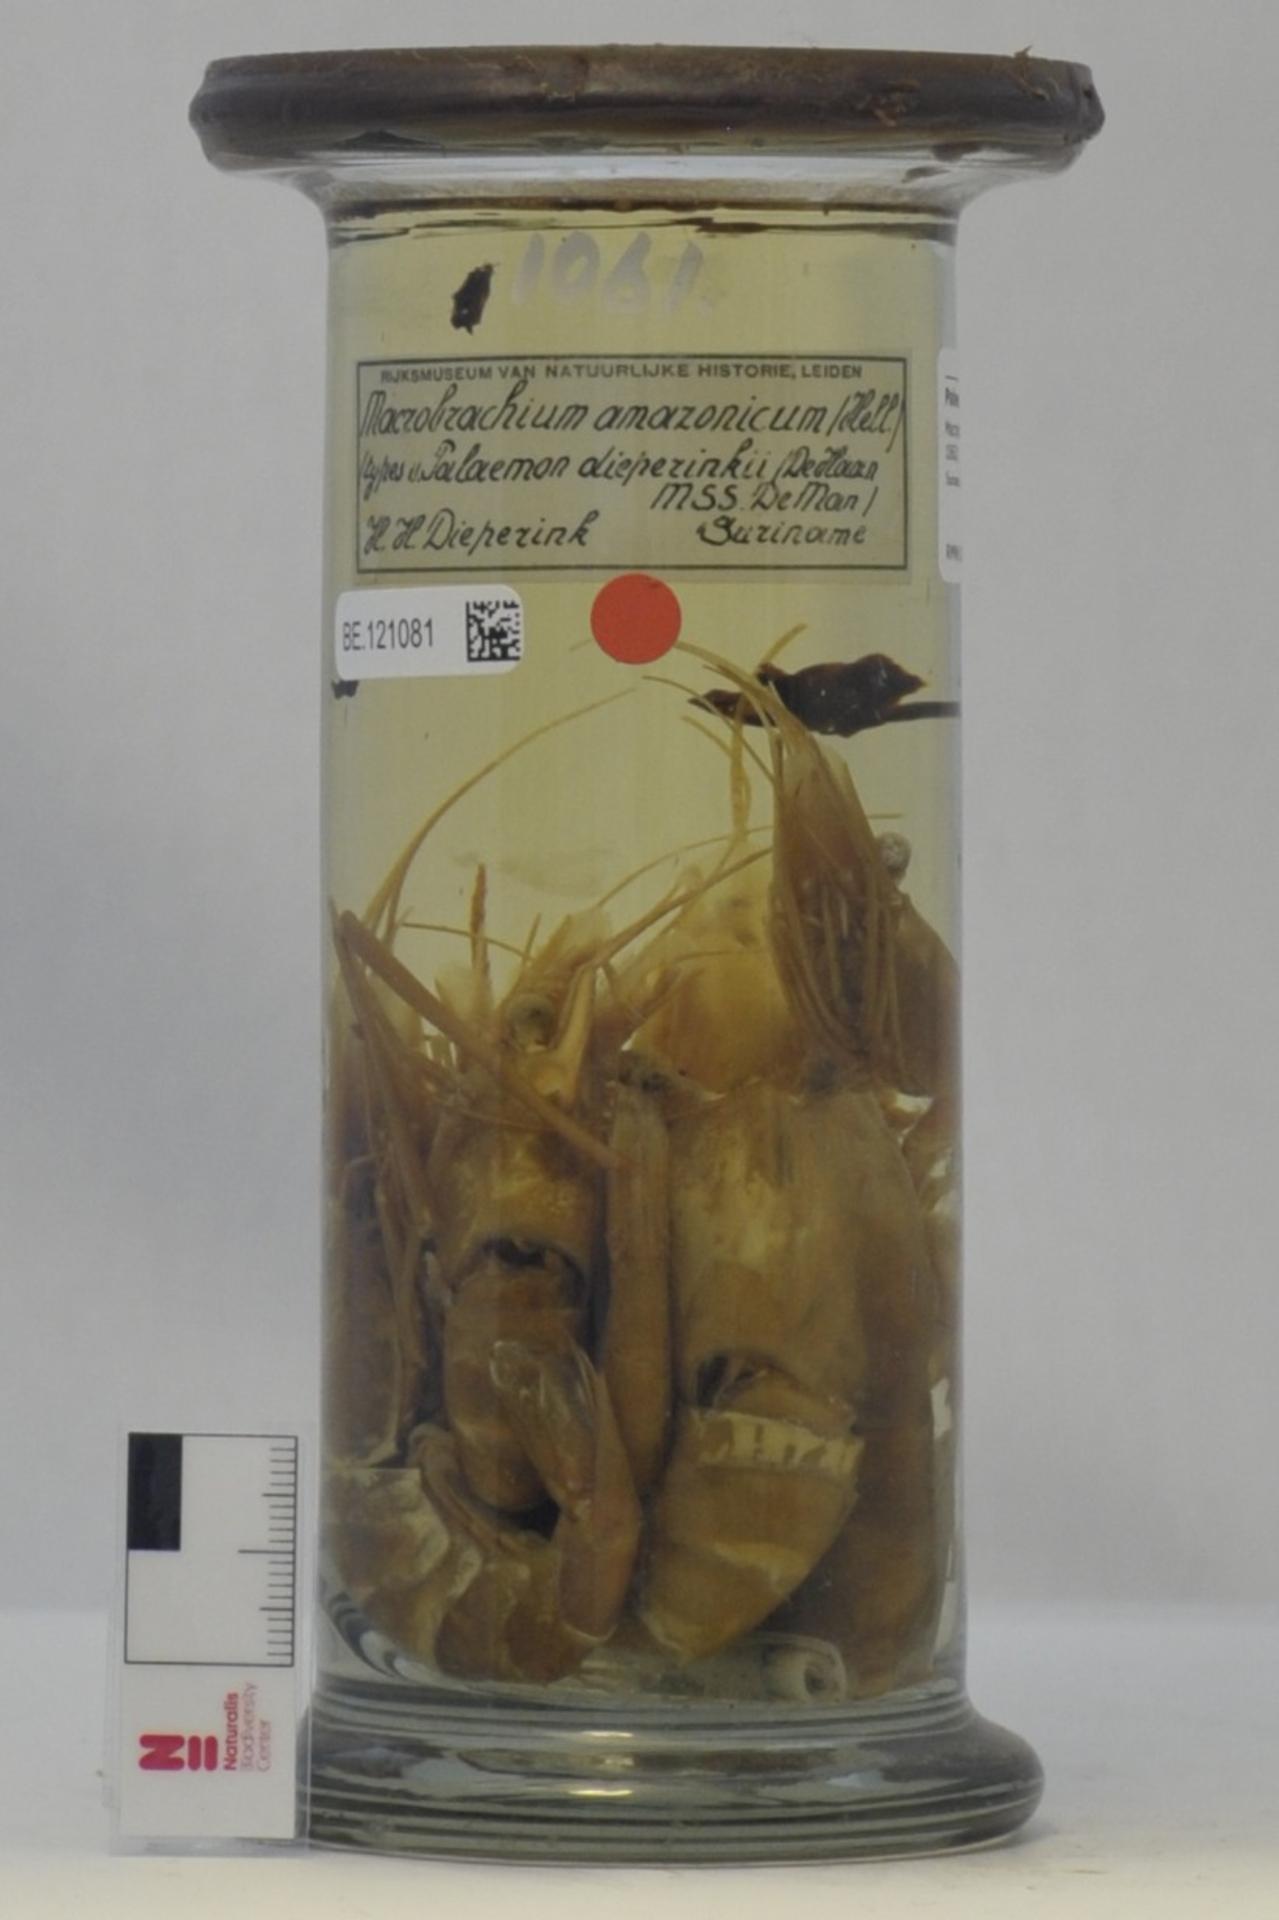 RMNH.CRUS.D.1061 | Macrobrachium amazonicum (Heller, 1862)